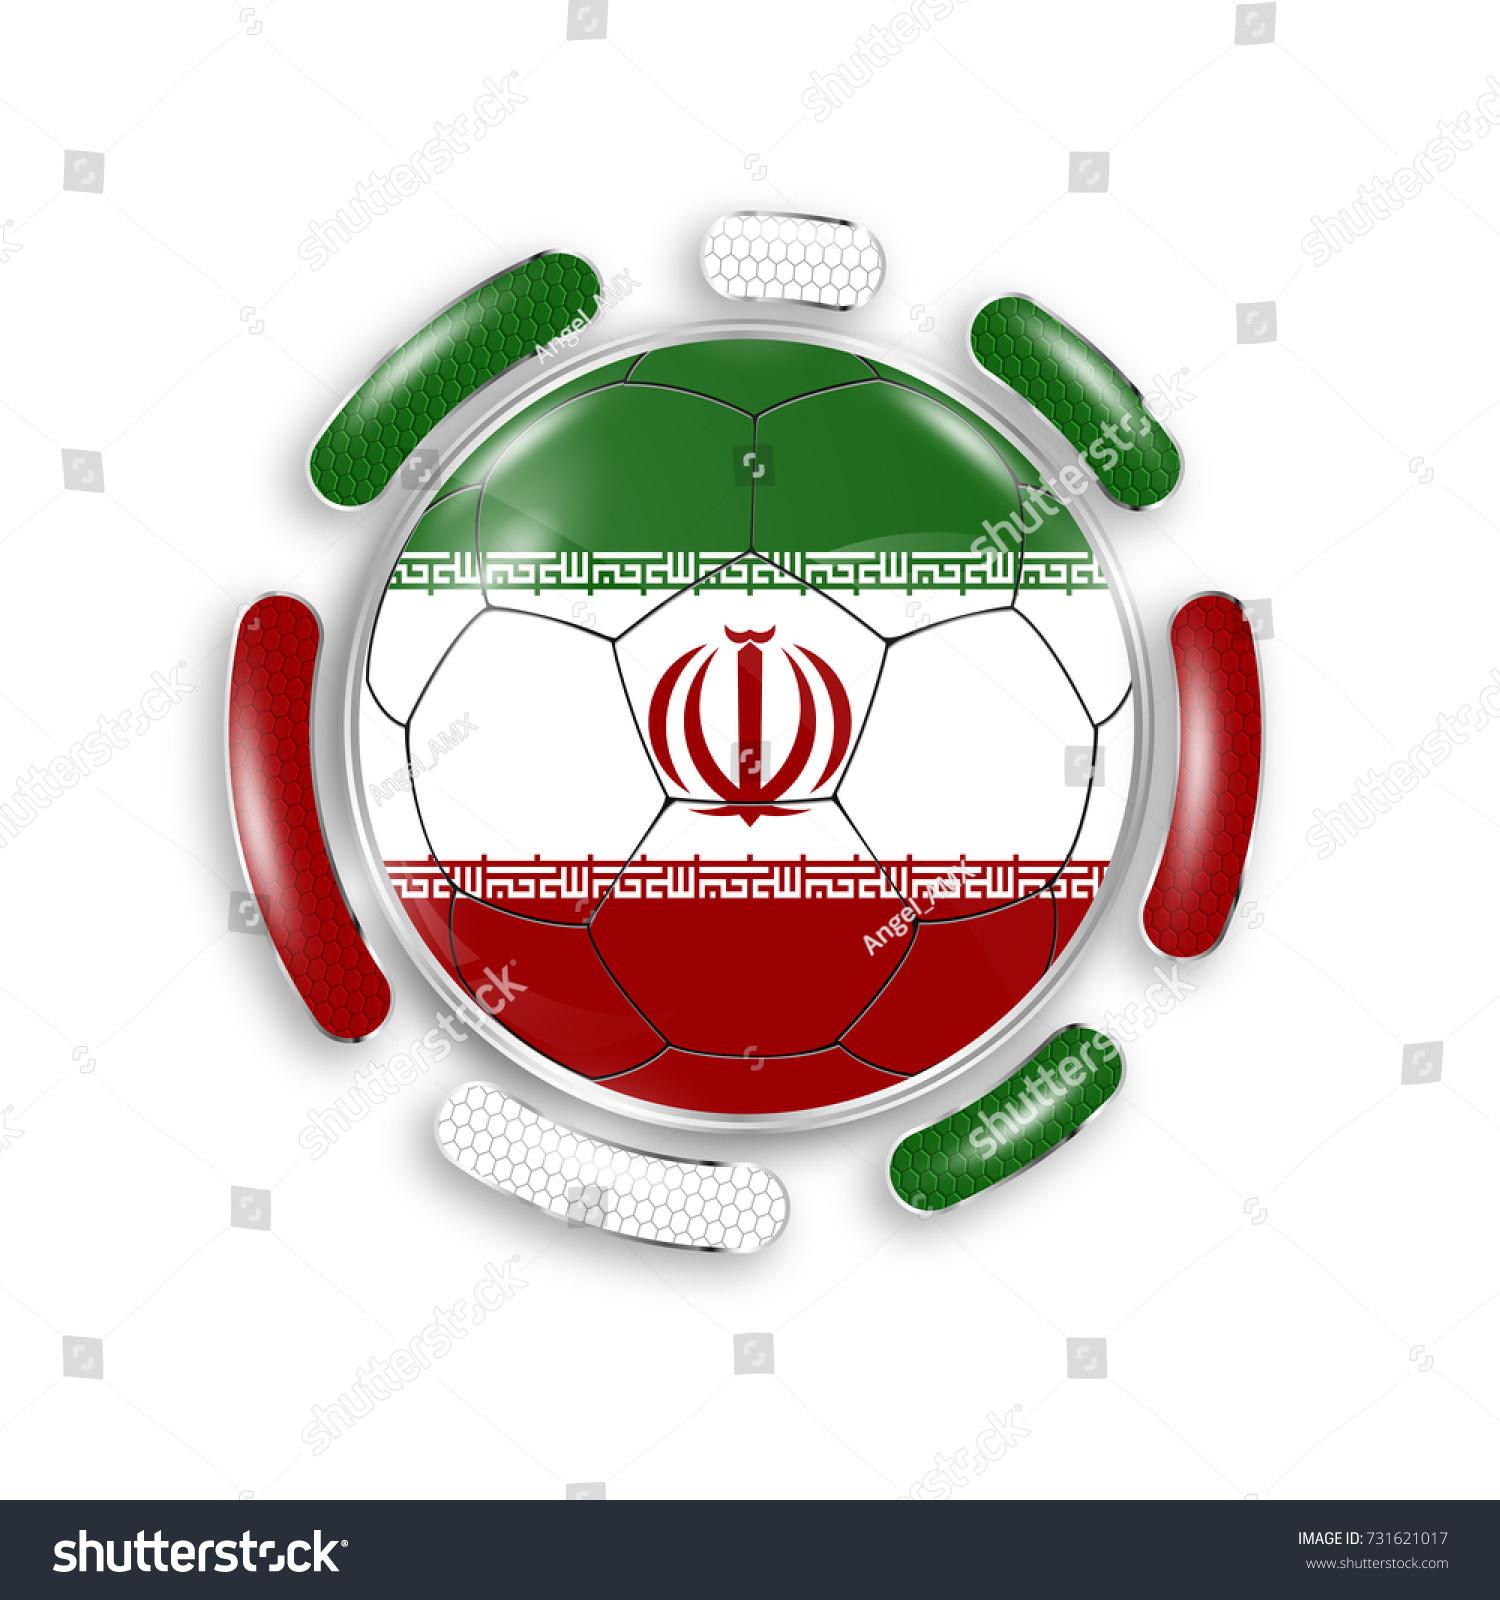 Soccer ball national flag iran modern stock vector 731621017 soccer ball with the national flag of iran modern emblem of soccer team realistic buycottarizona Choice Image